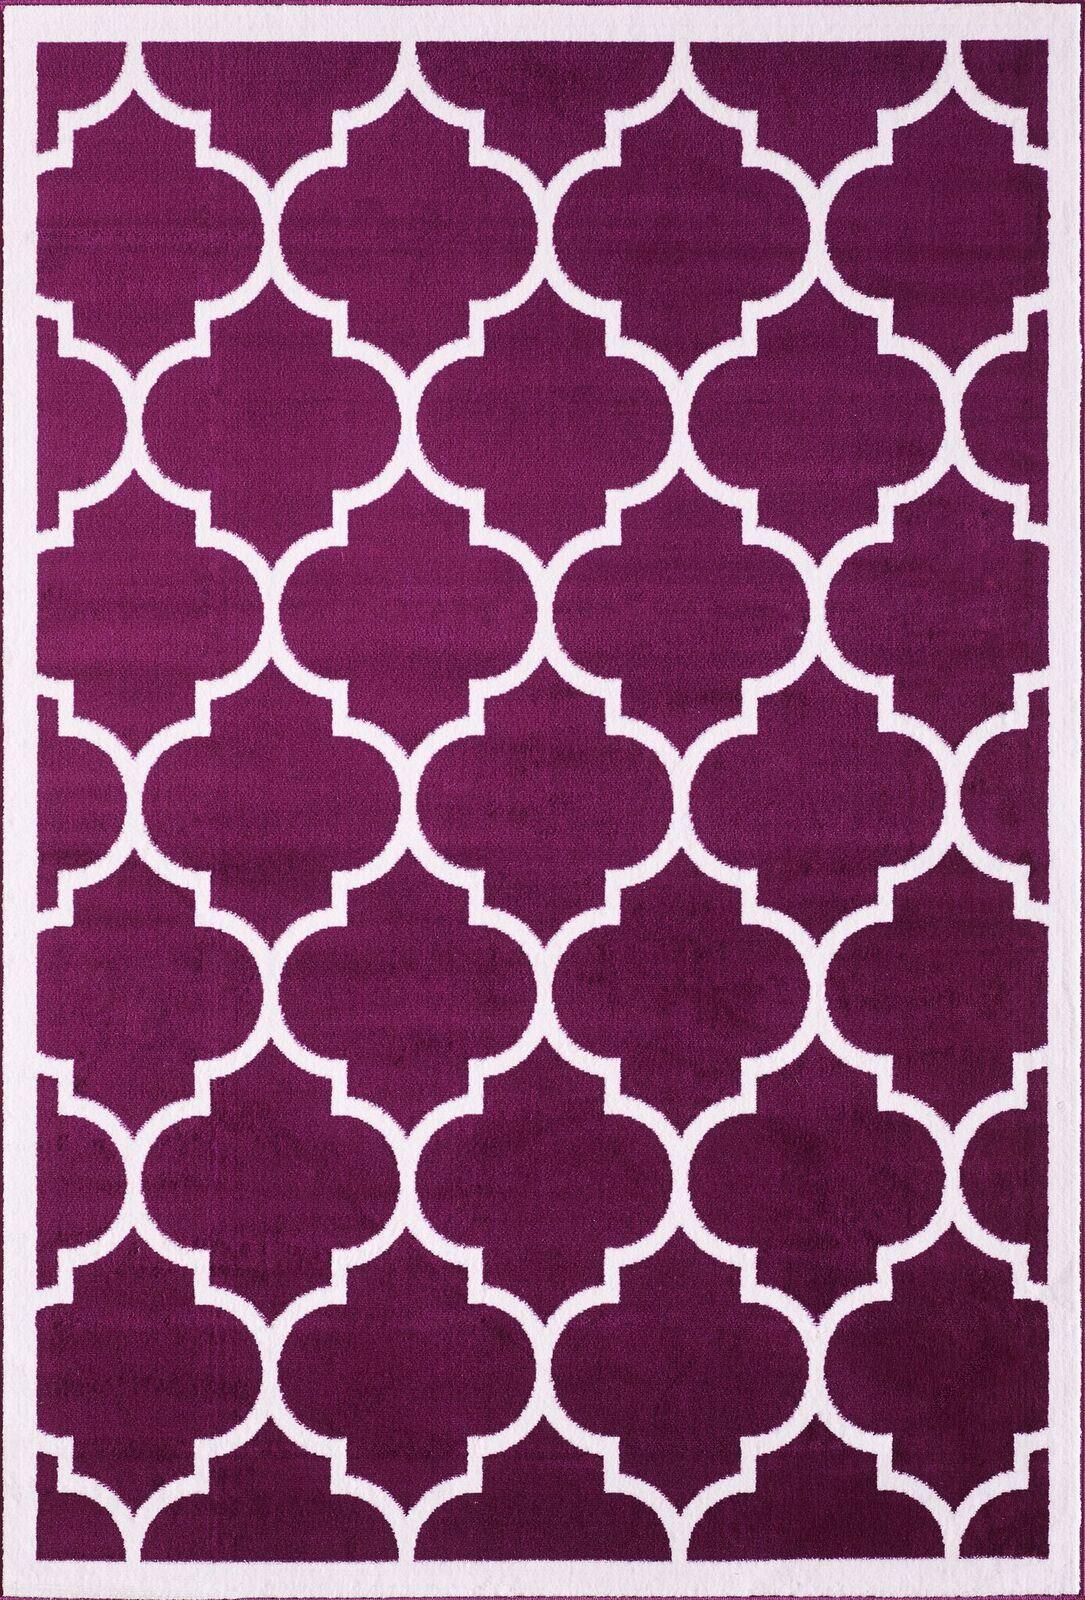 Large-Modern-Classic-Trellis-INDOOR-RUGS-Coloured-Floor-Carpet-Outdoor-Rug-Mats thumbnail 27